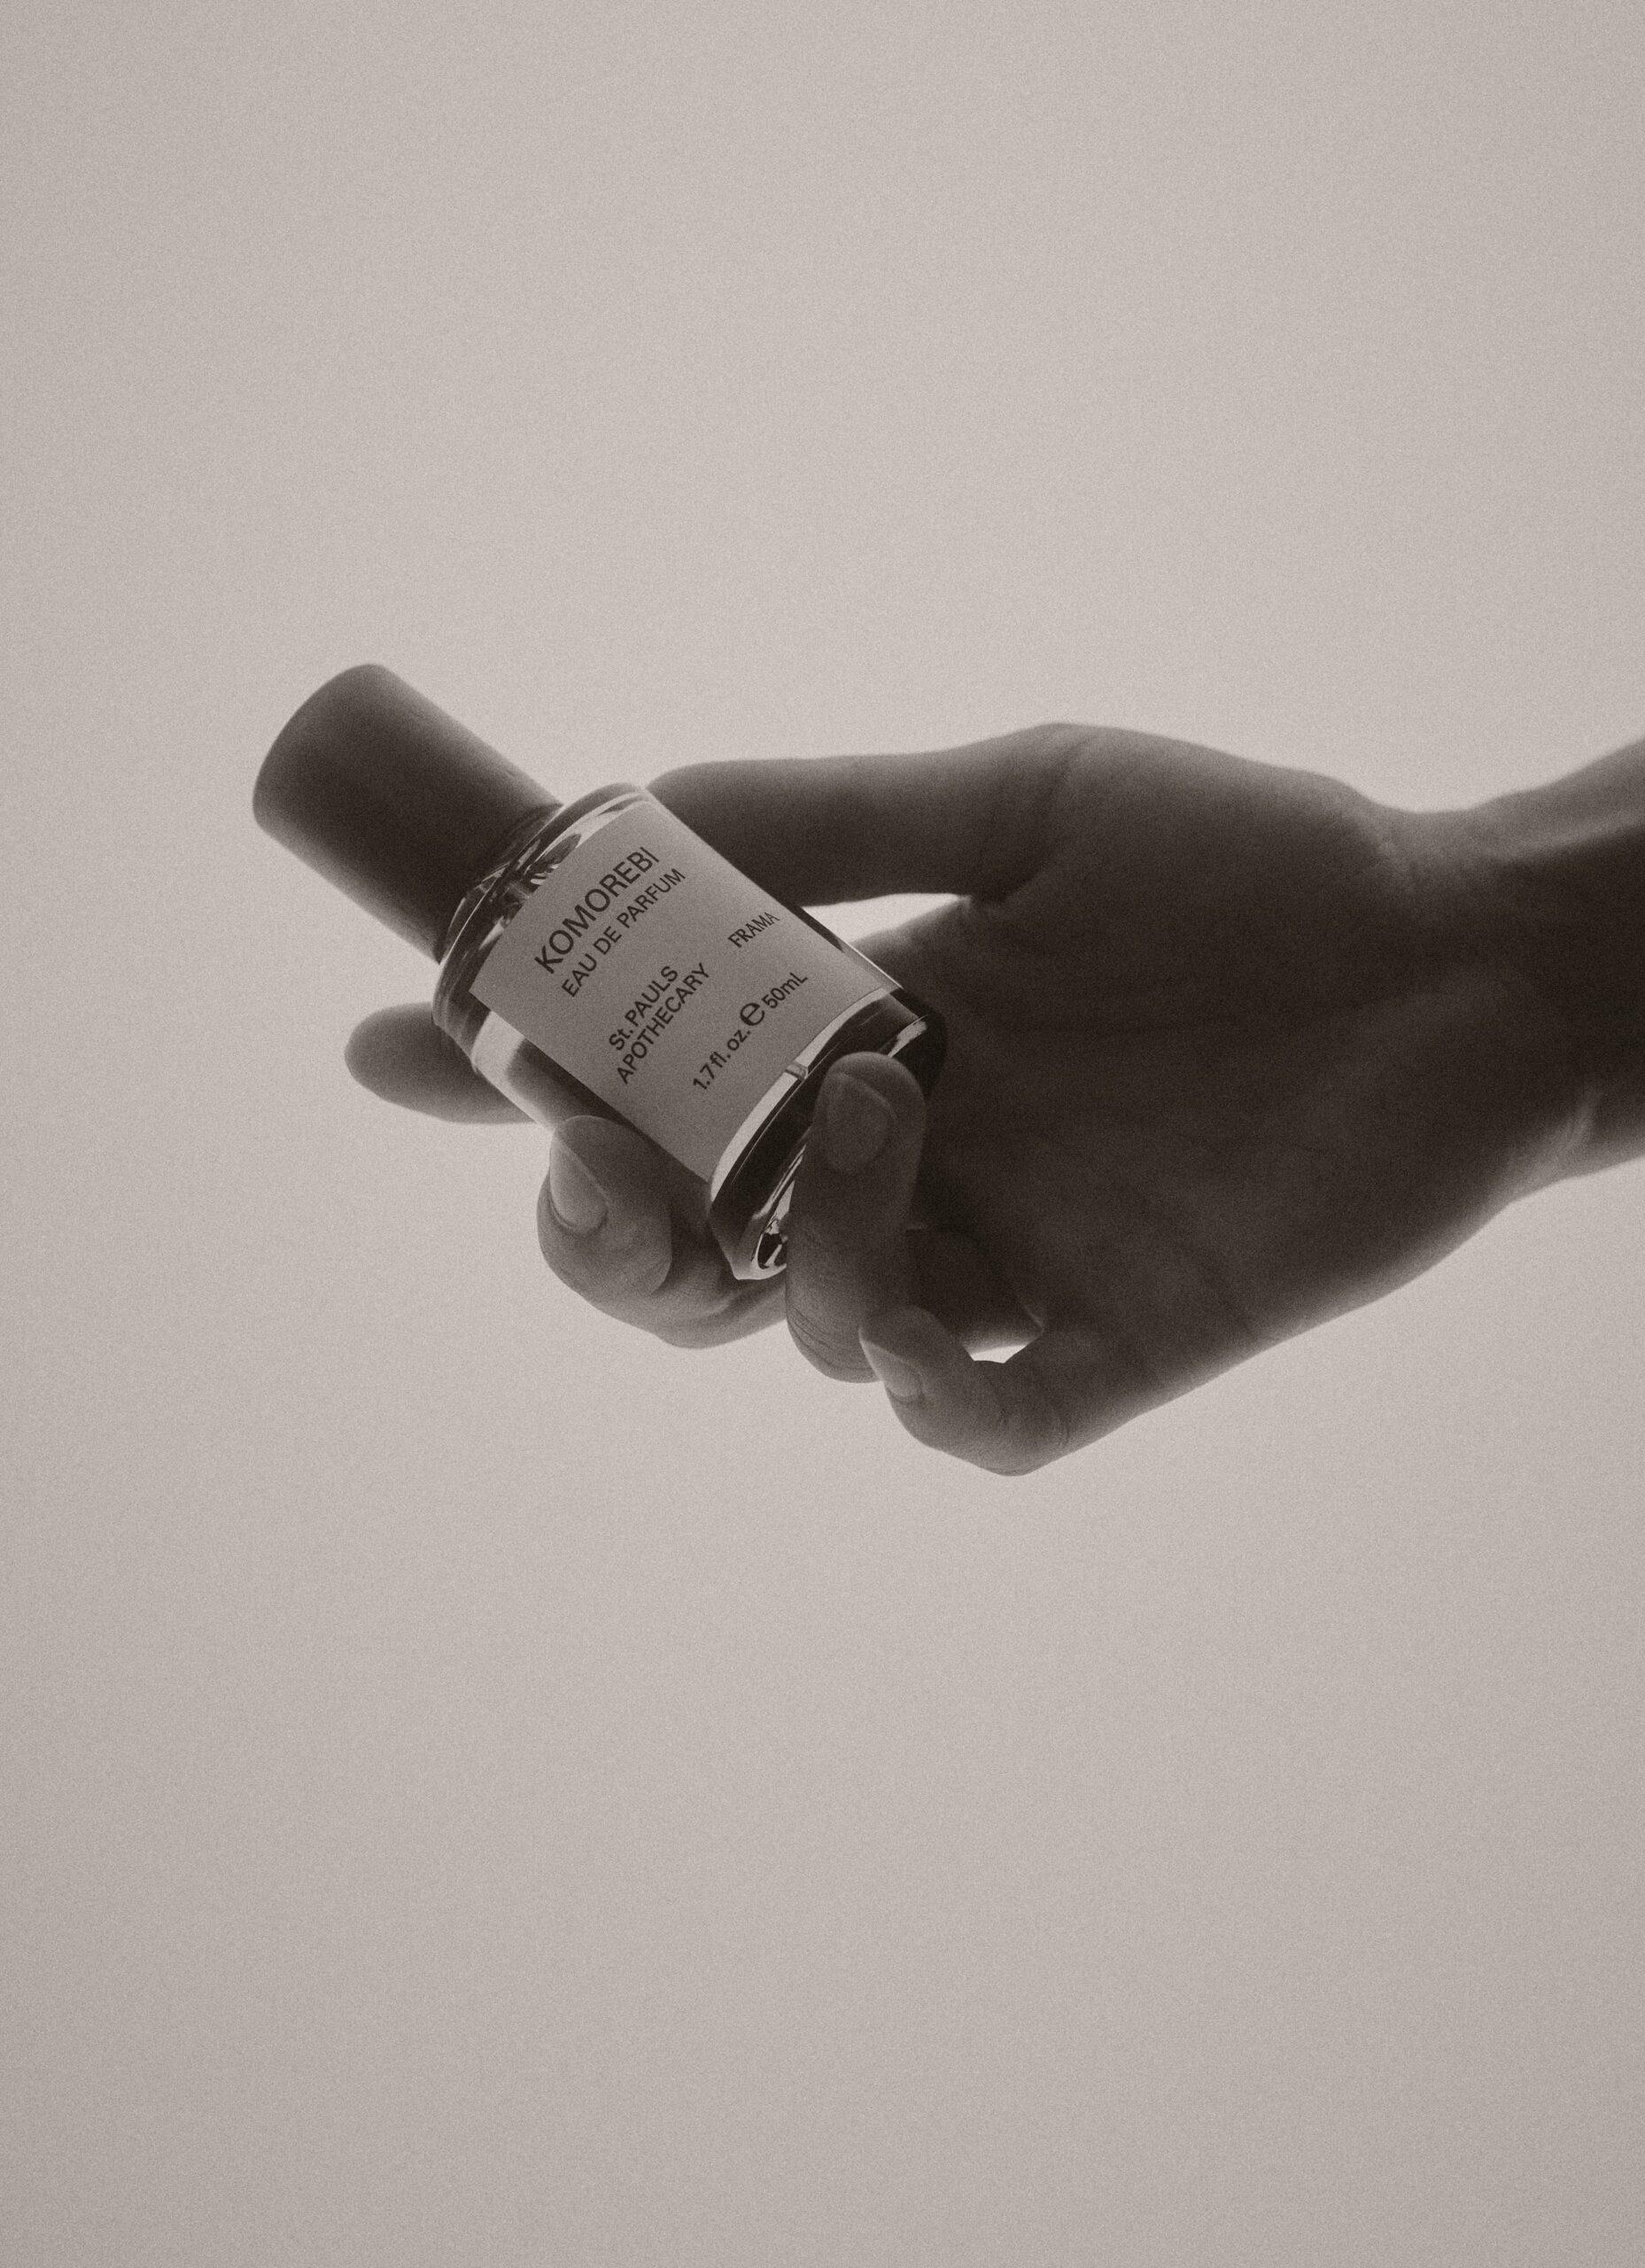 Frama - St. Pauls Apothecary - Komorebi - Eau de Parfum - 50ml